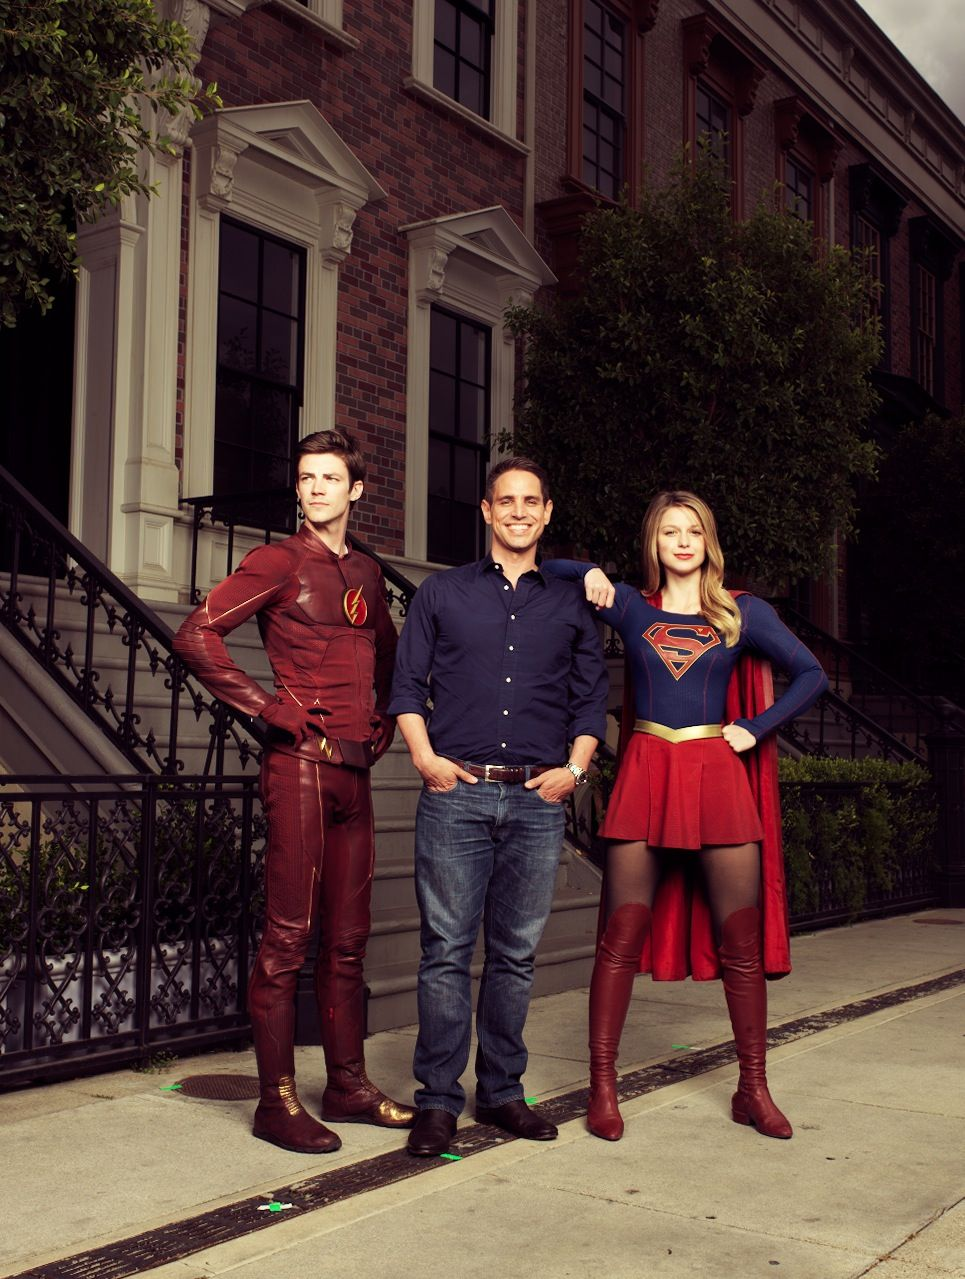 Actor Grant Gustin as The Flash/Berry Allen, producer Greg Berlanti and actress Melissa Benoist as SuperGirl/Kara Zor-El